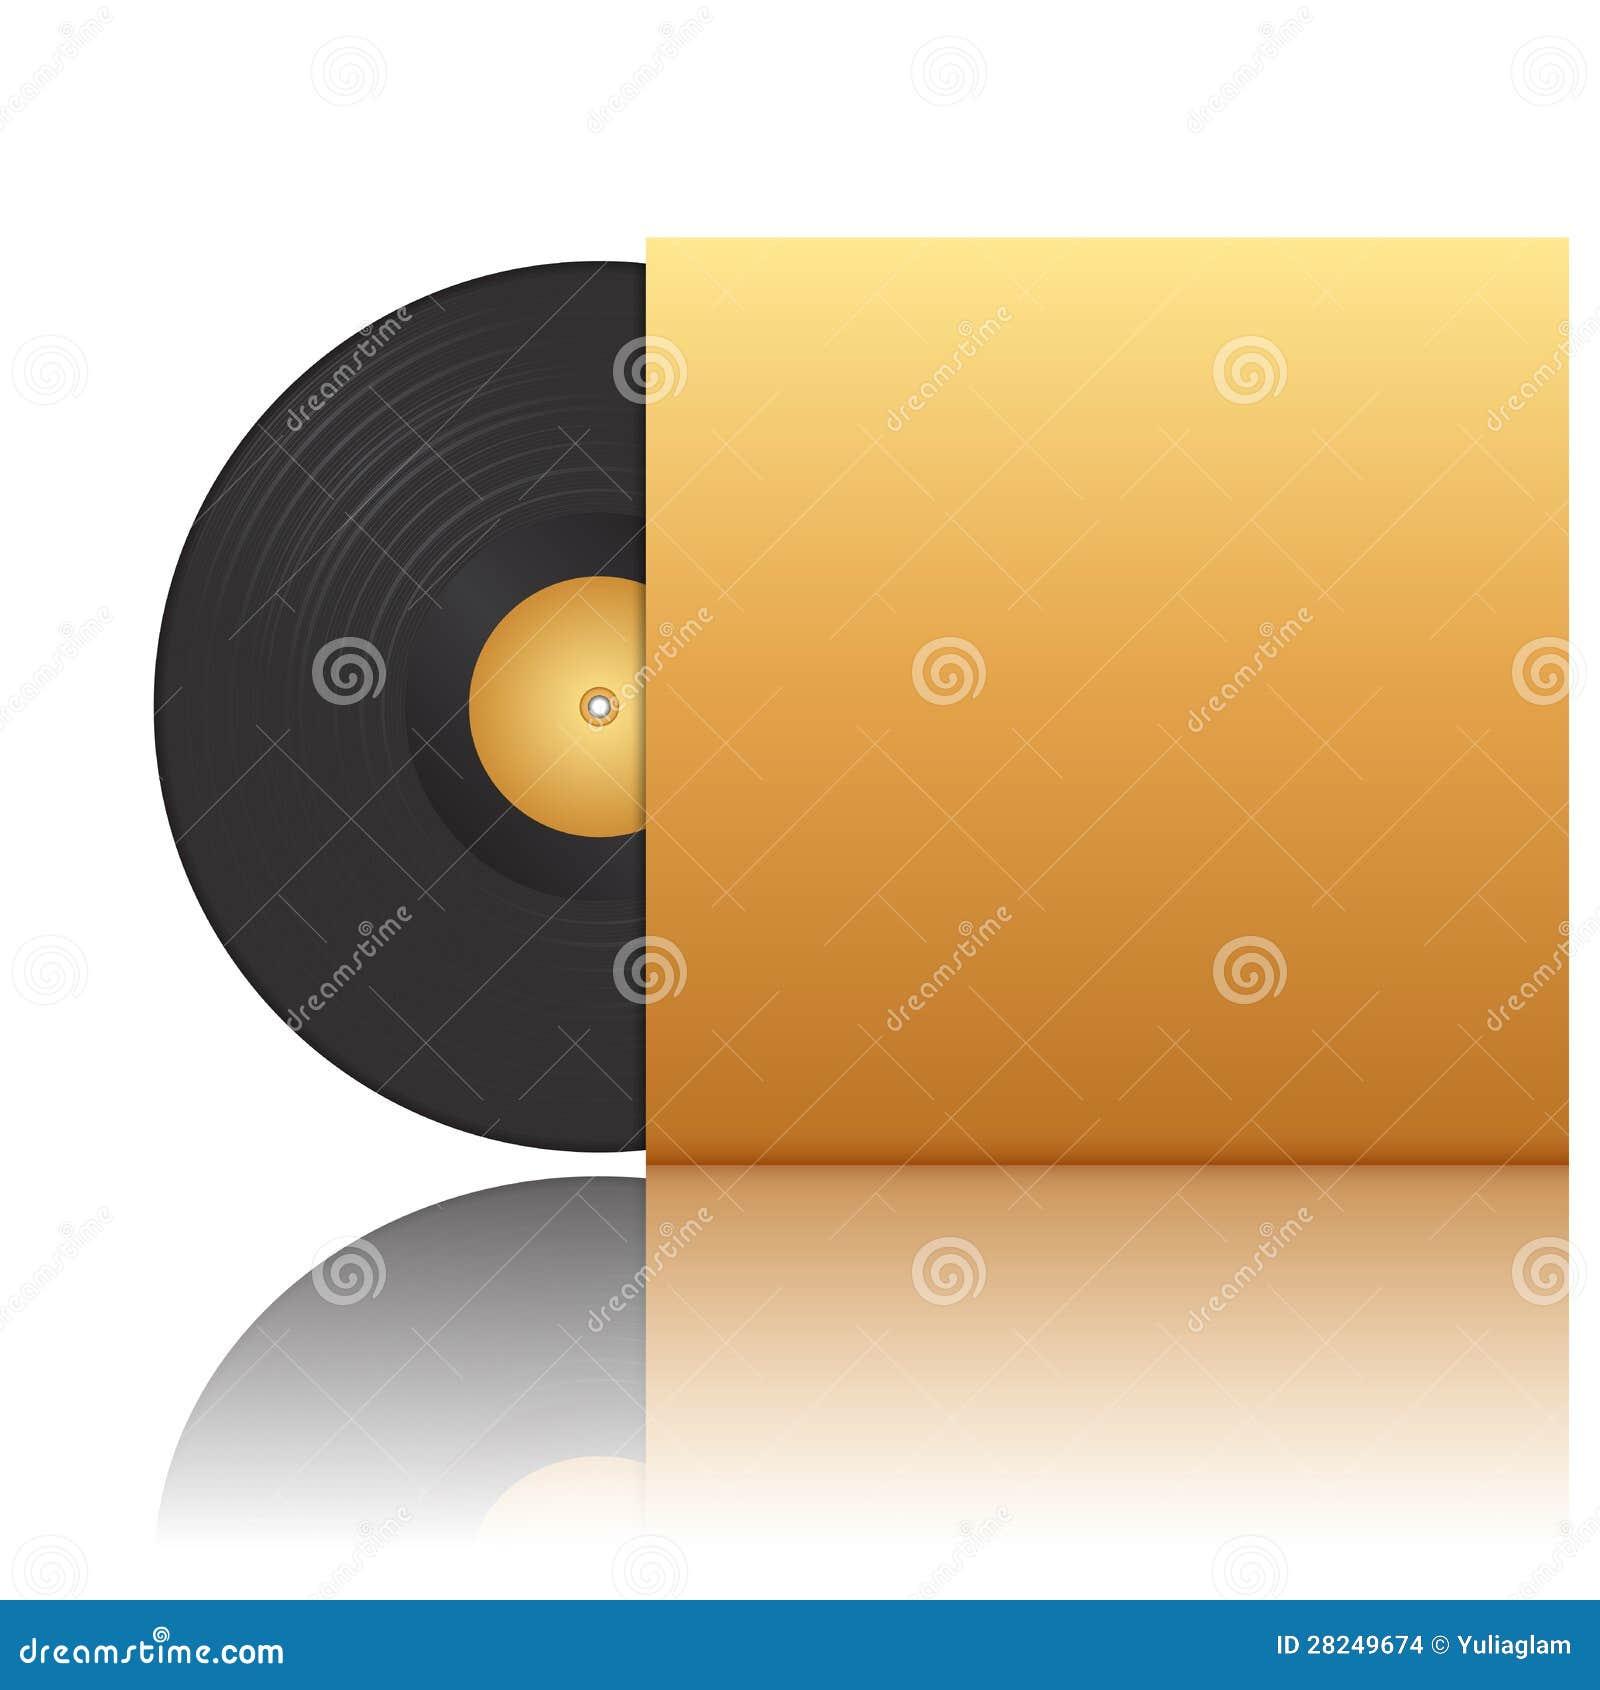 Vinyl record in envelope